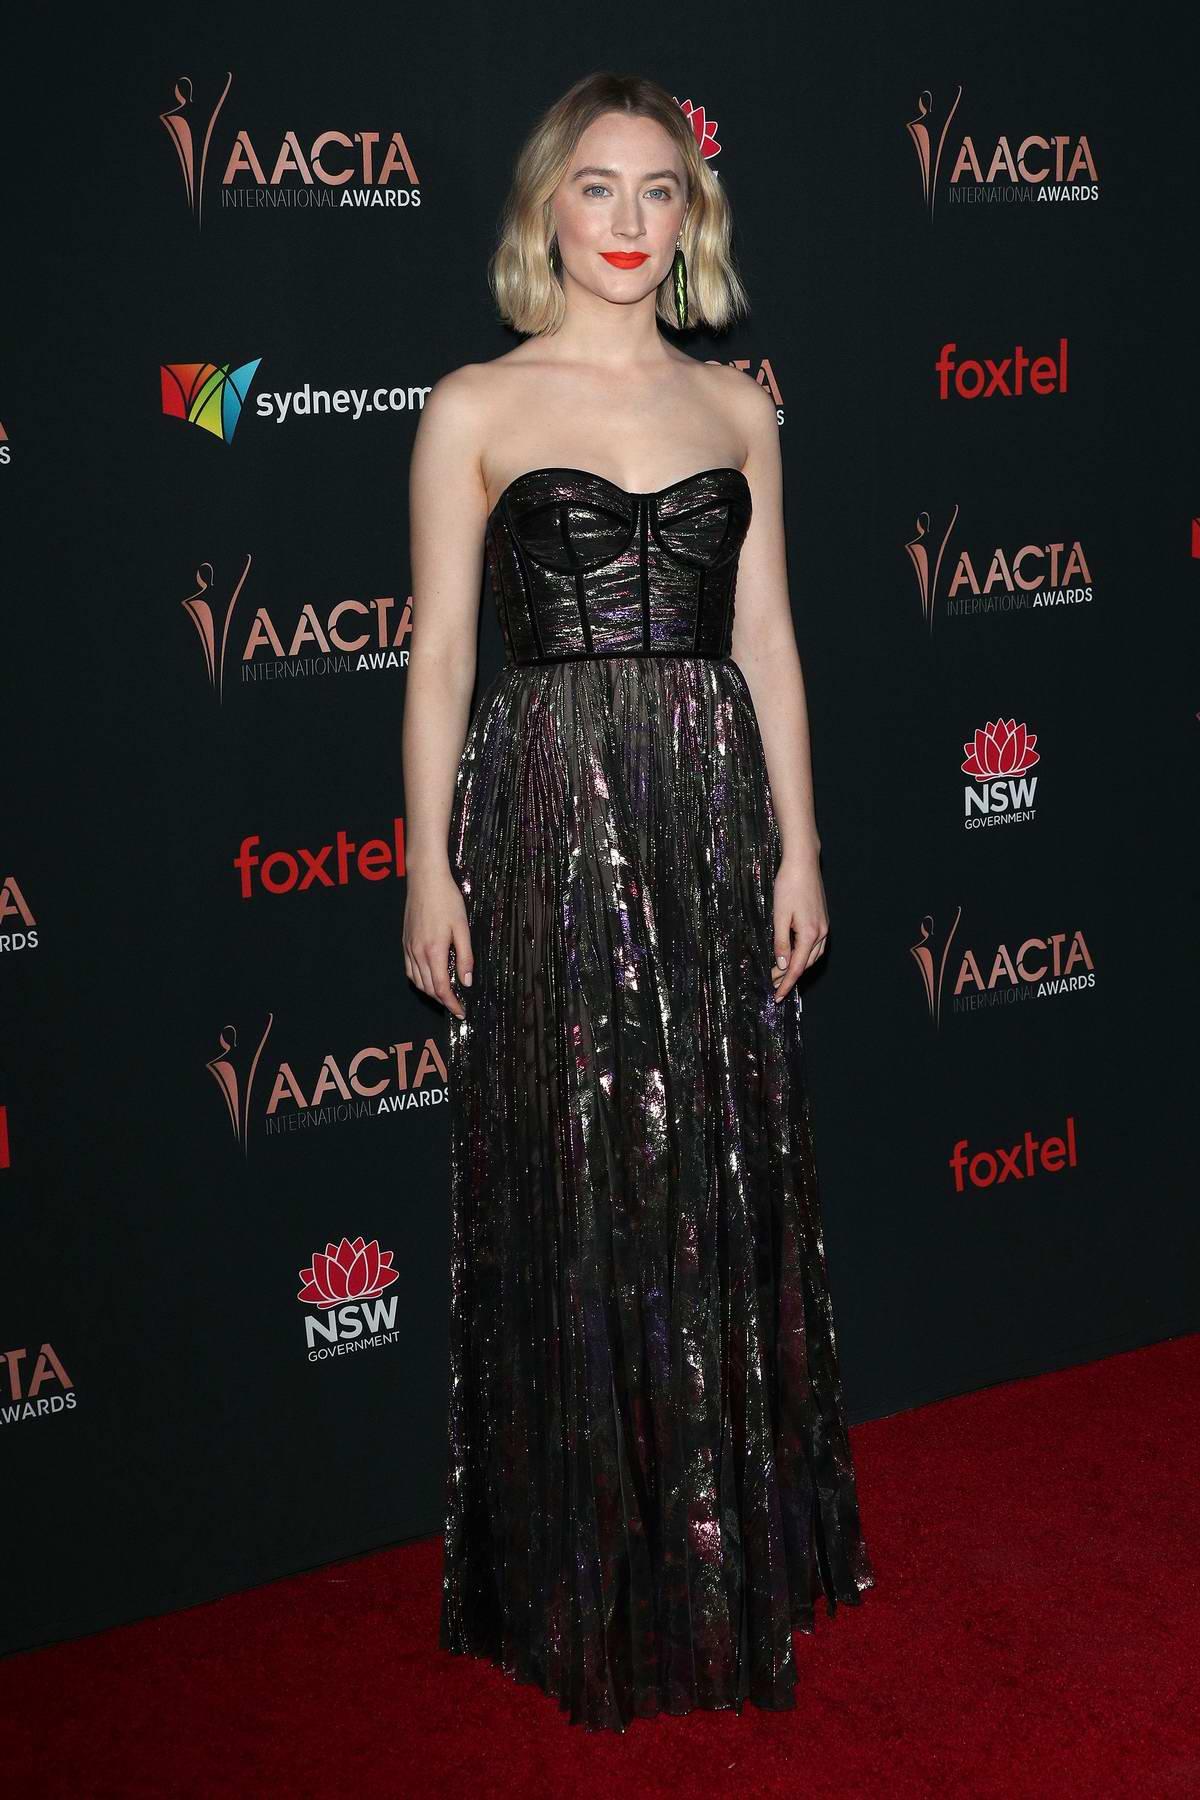 Saoirse Ronan attends the 9th Annual AACTA International Awards at the Mondrian Los Angeles